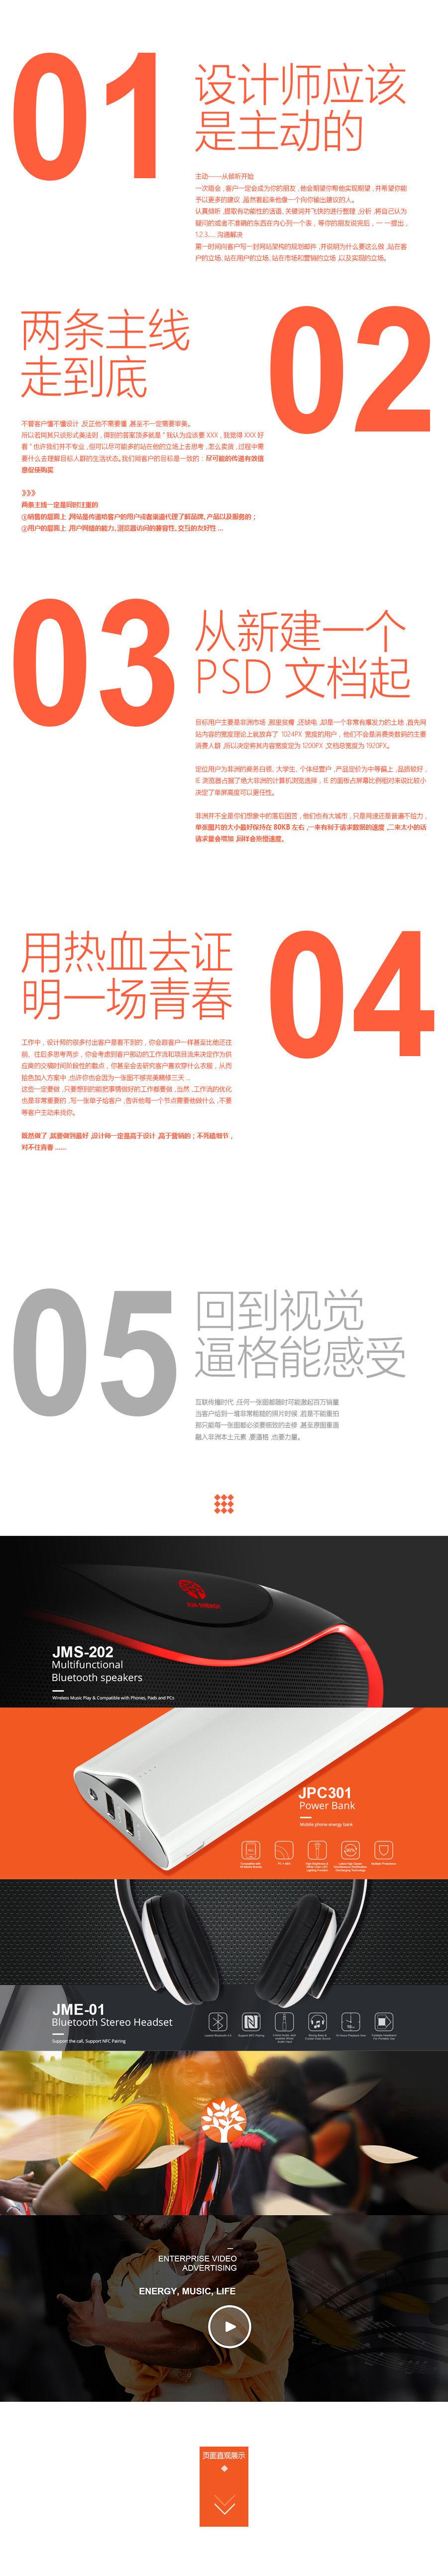 JUA WebShow 2.jpg